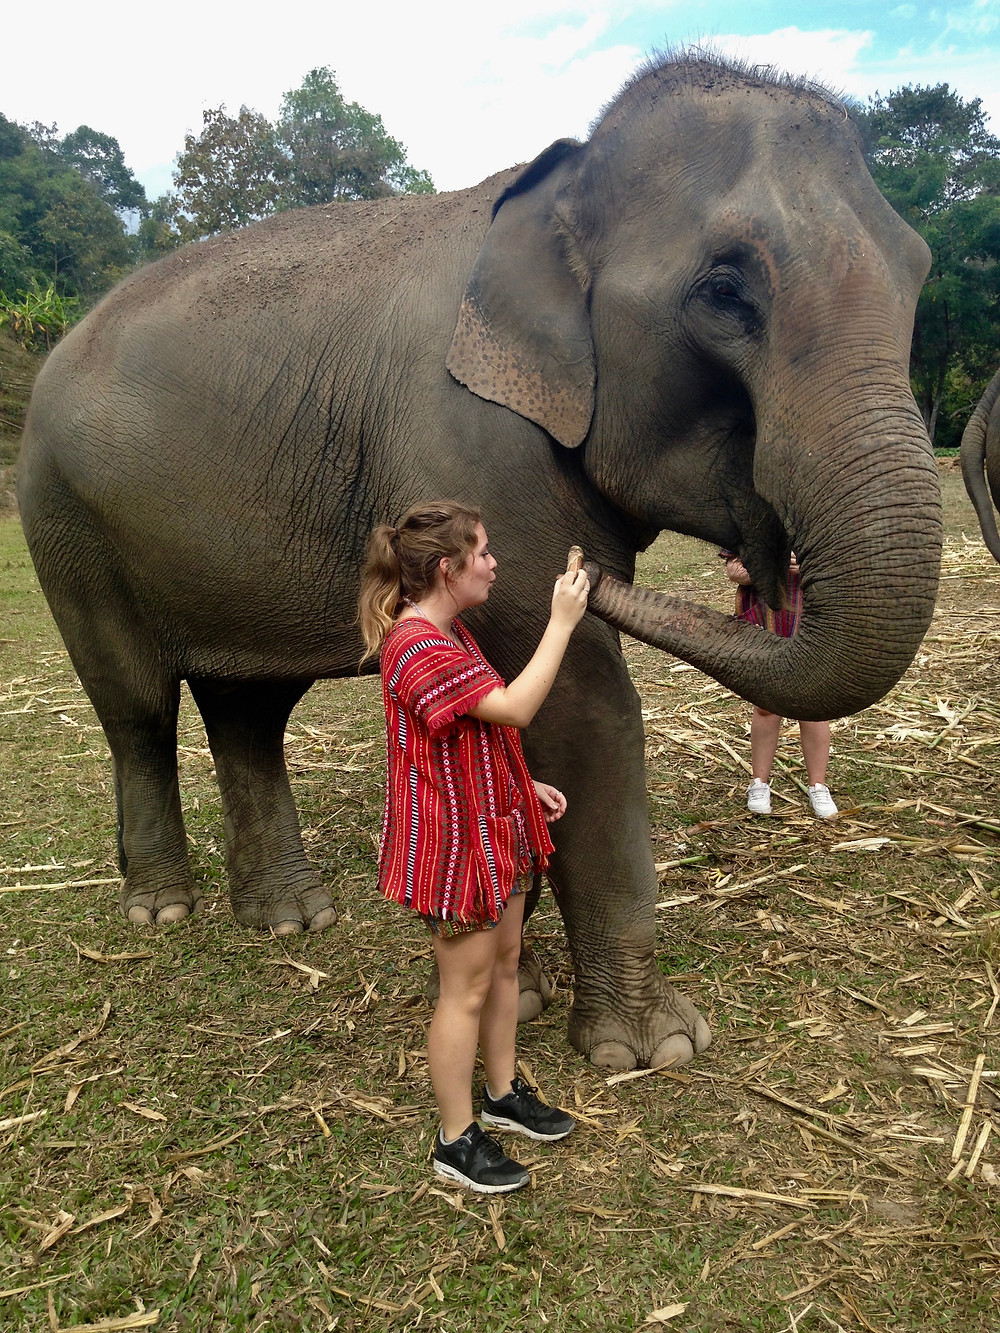 Feeding Elephants while having an Ethical Elephant Experience Thailand Chiang Mai